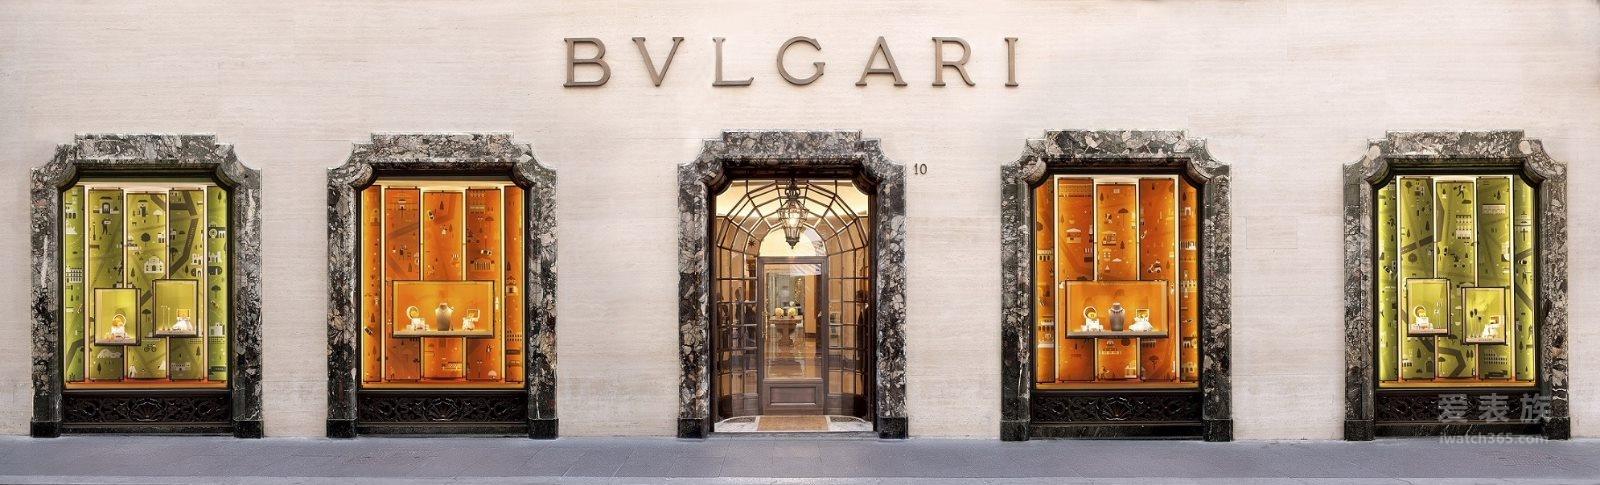 BVLGARI宝格丽夏日特别推荐 开启罗马假日欢愉之旅